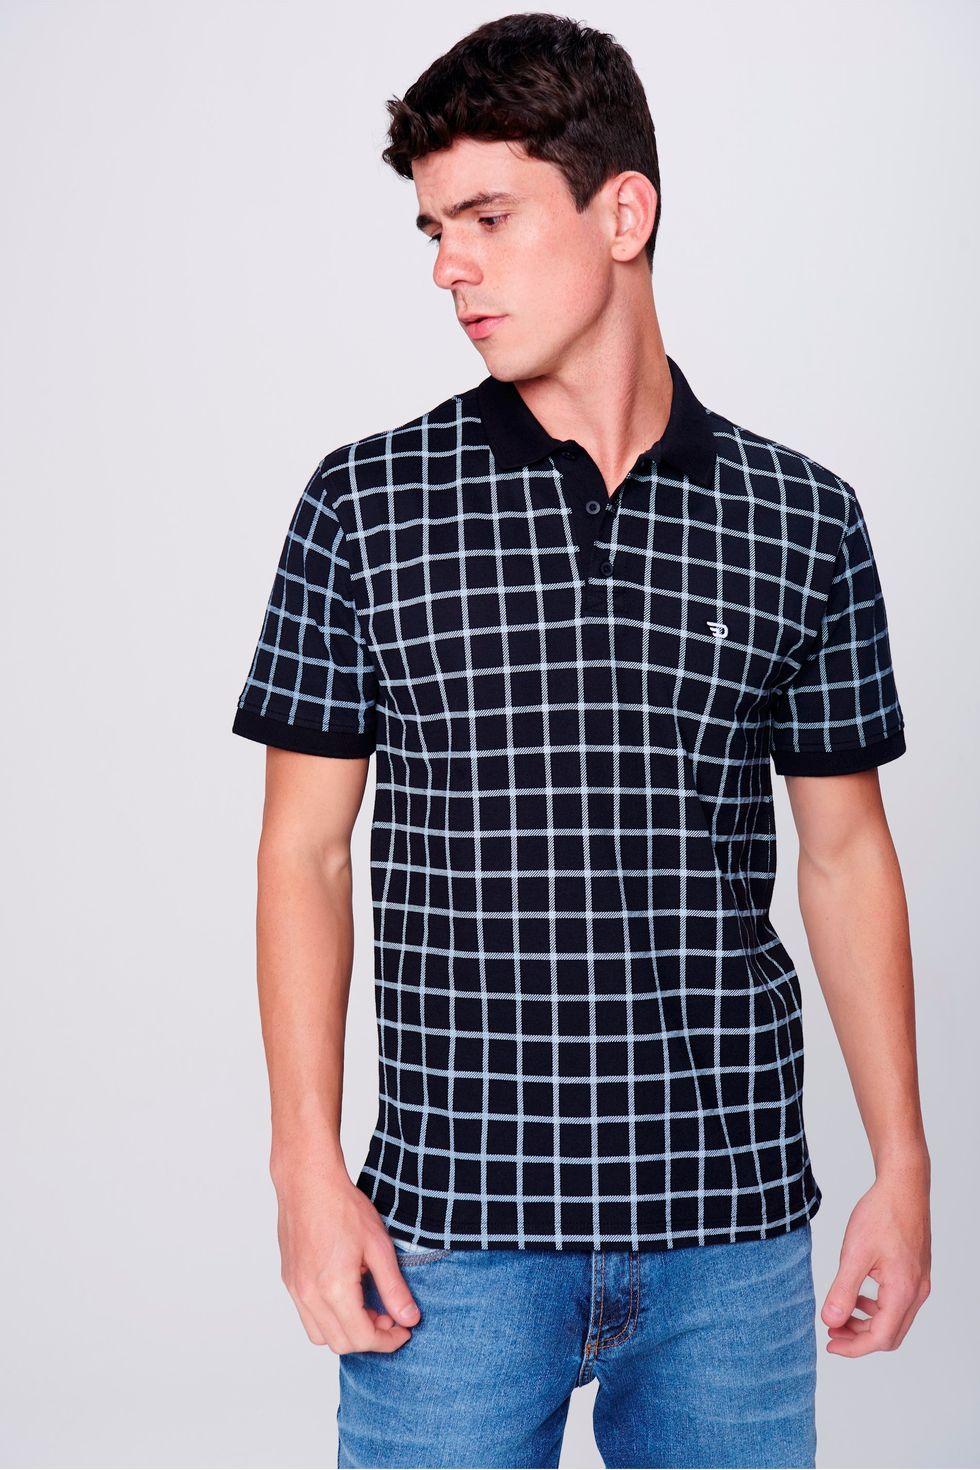 Camisa-Gola-Polo-Fit-Xadrez-Masculina-Frente--